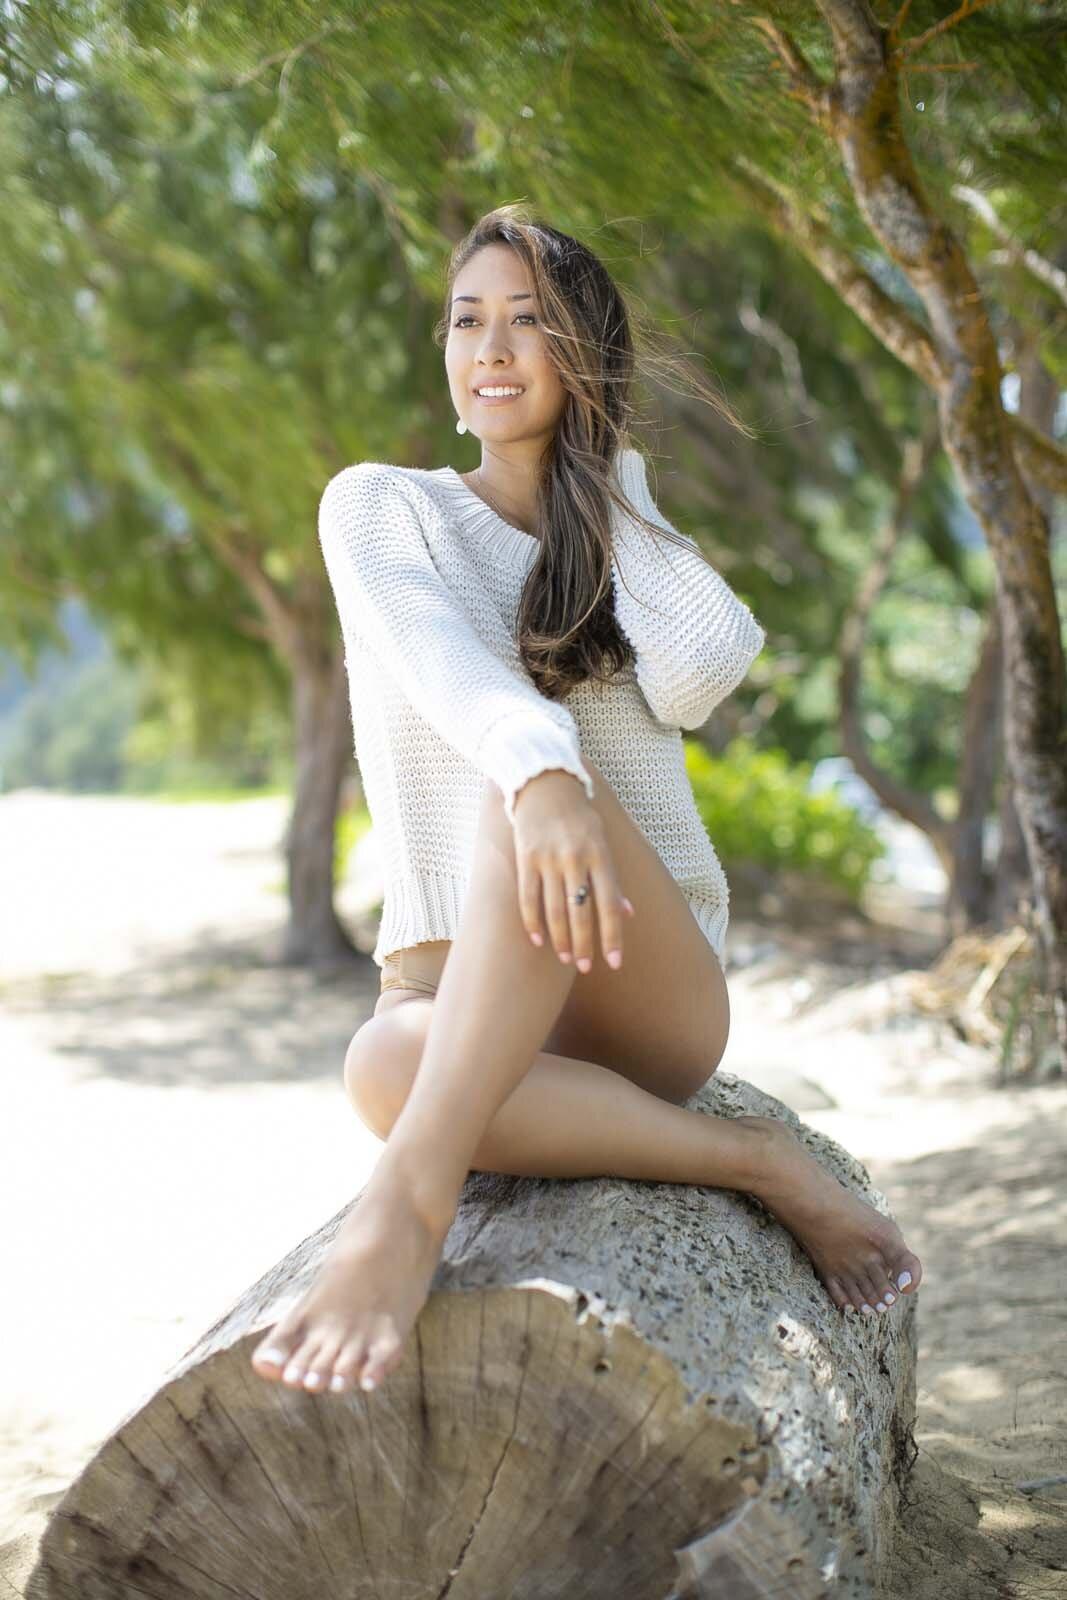 Lilia — bliss models and talent